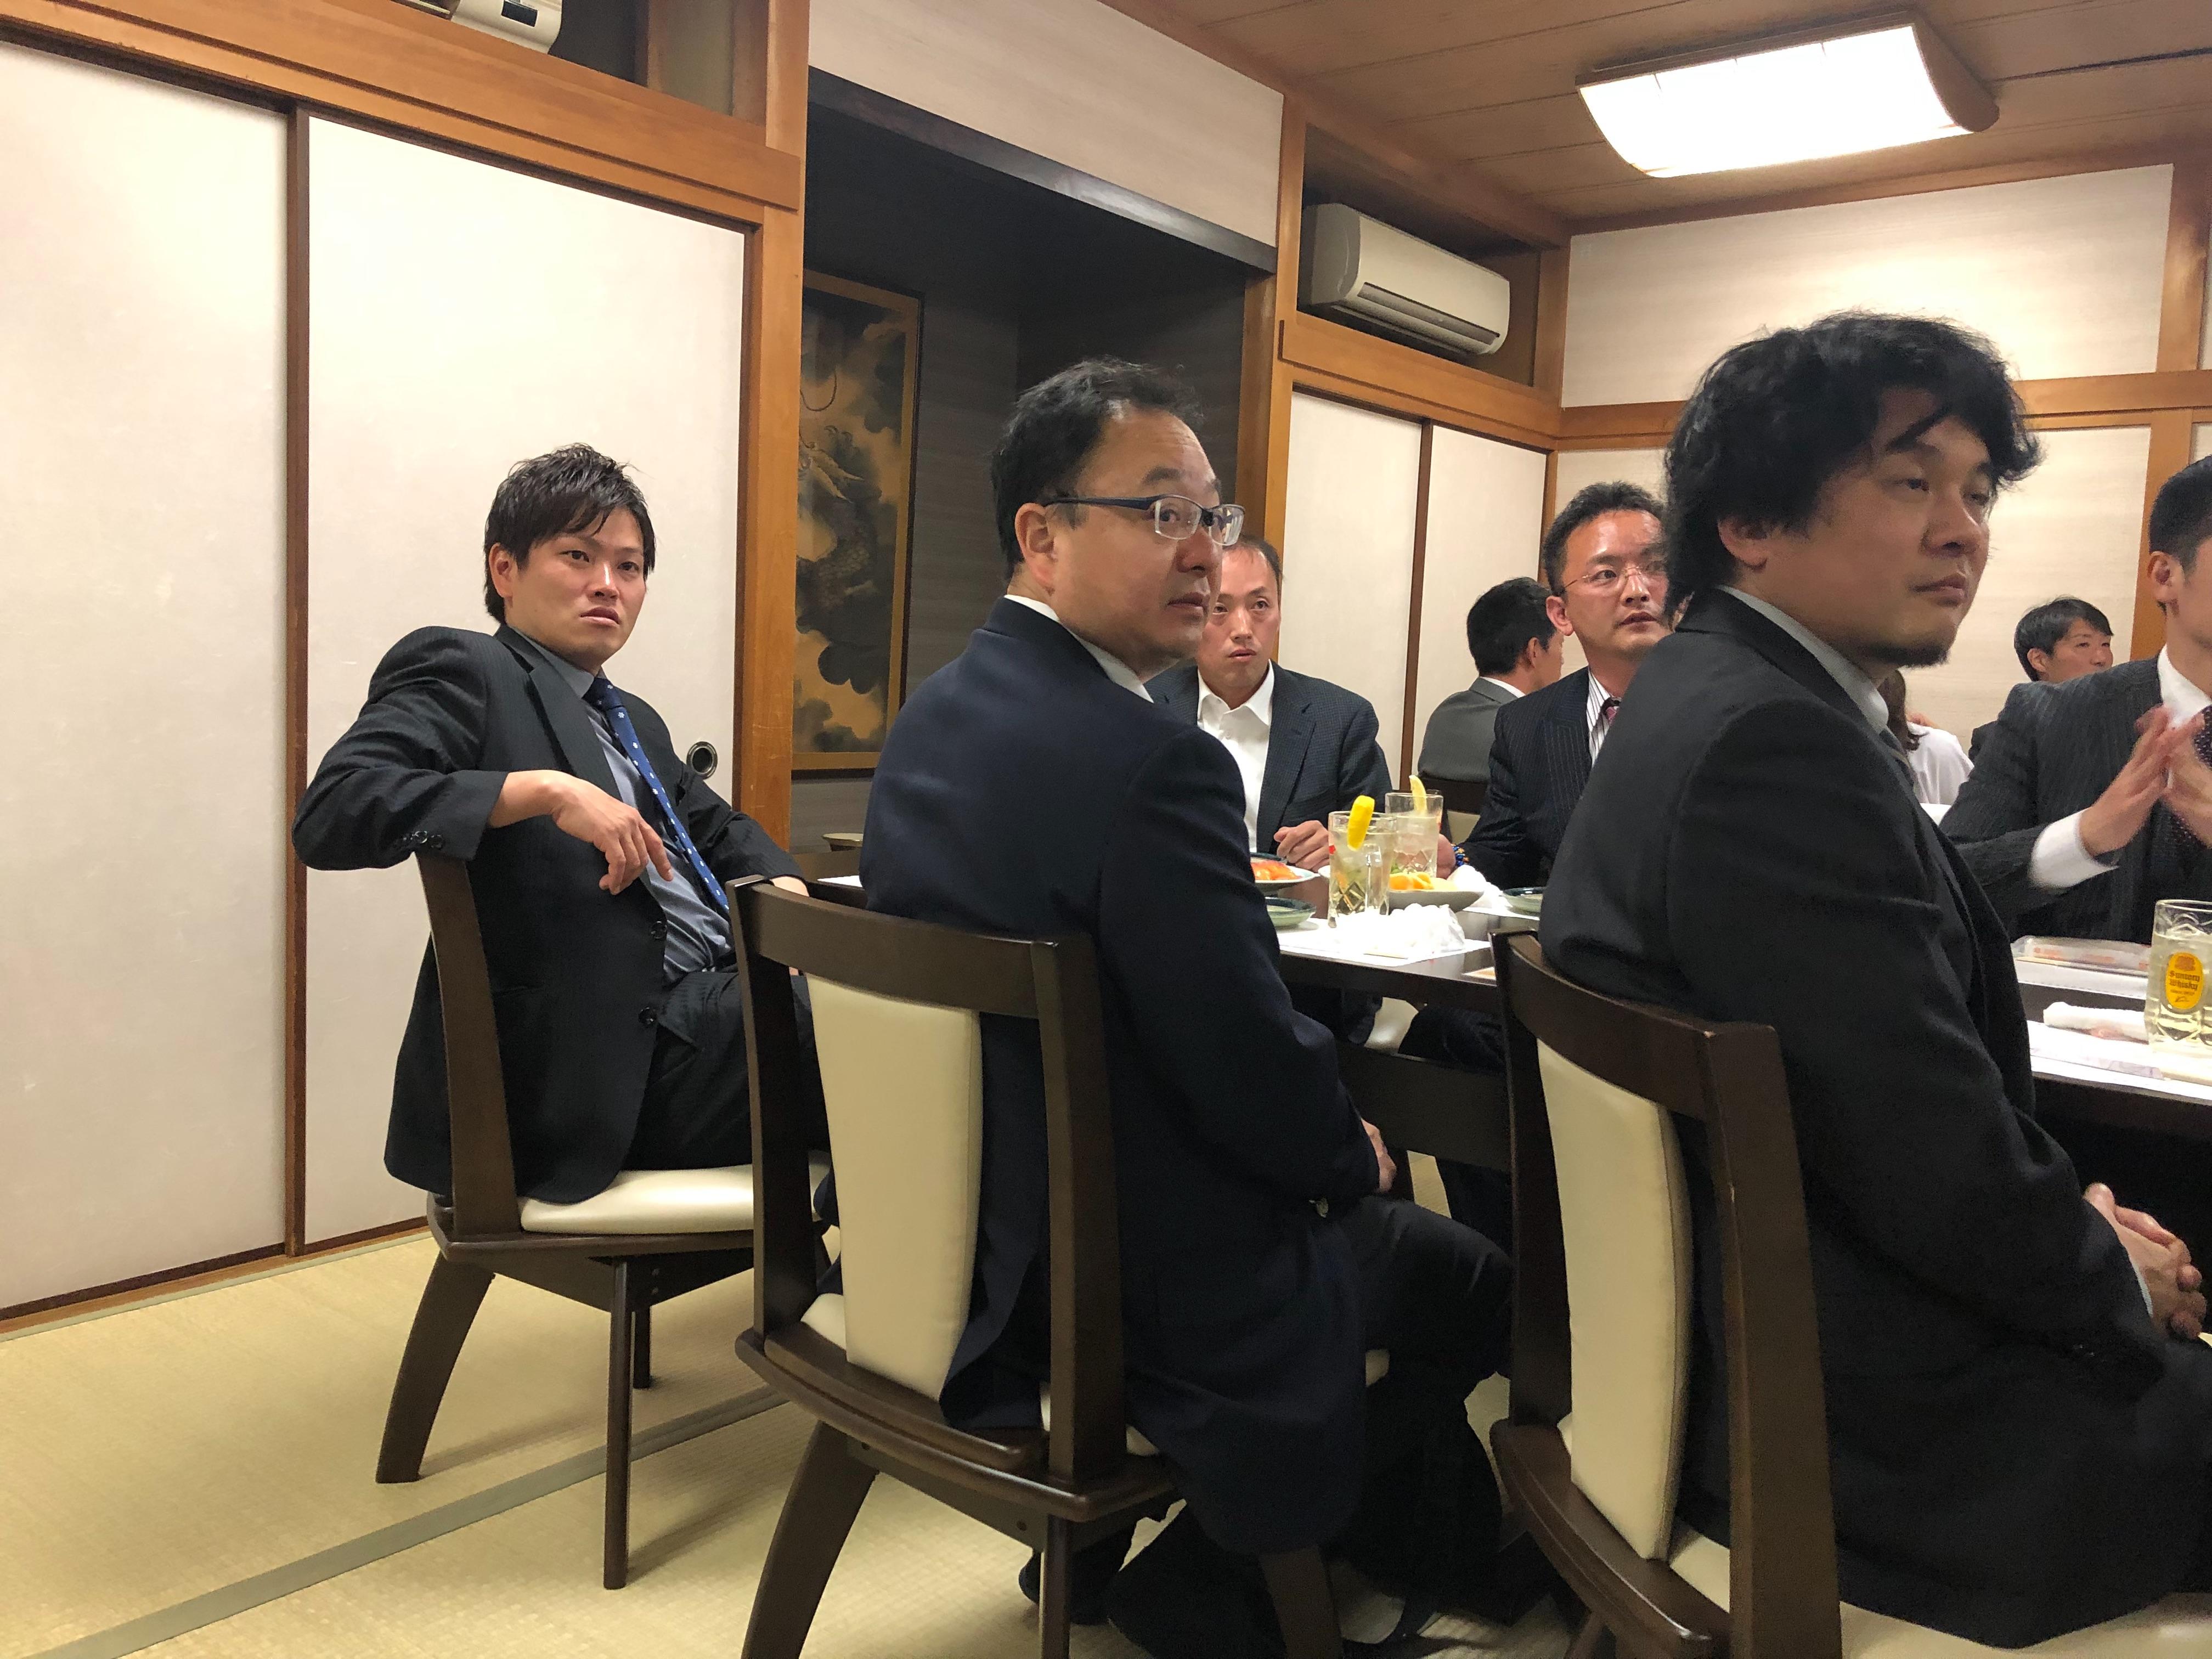 f:id:masanori-kato1972:20190408222350j:image